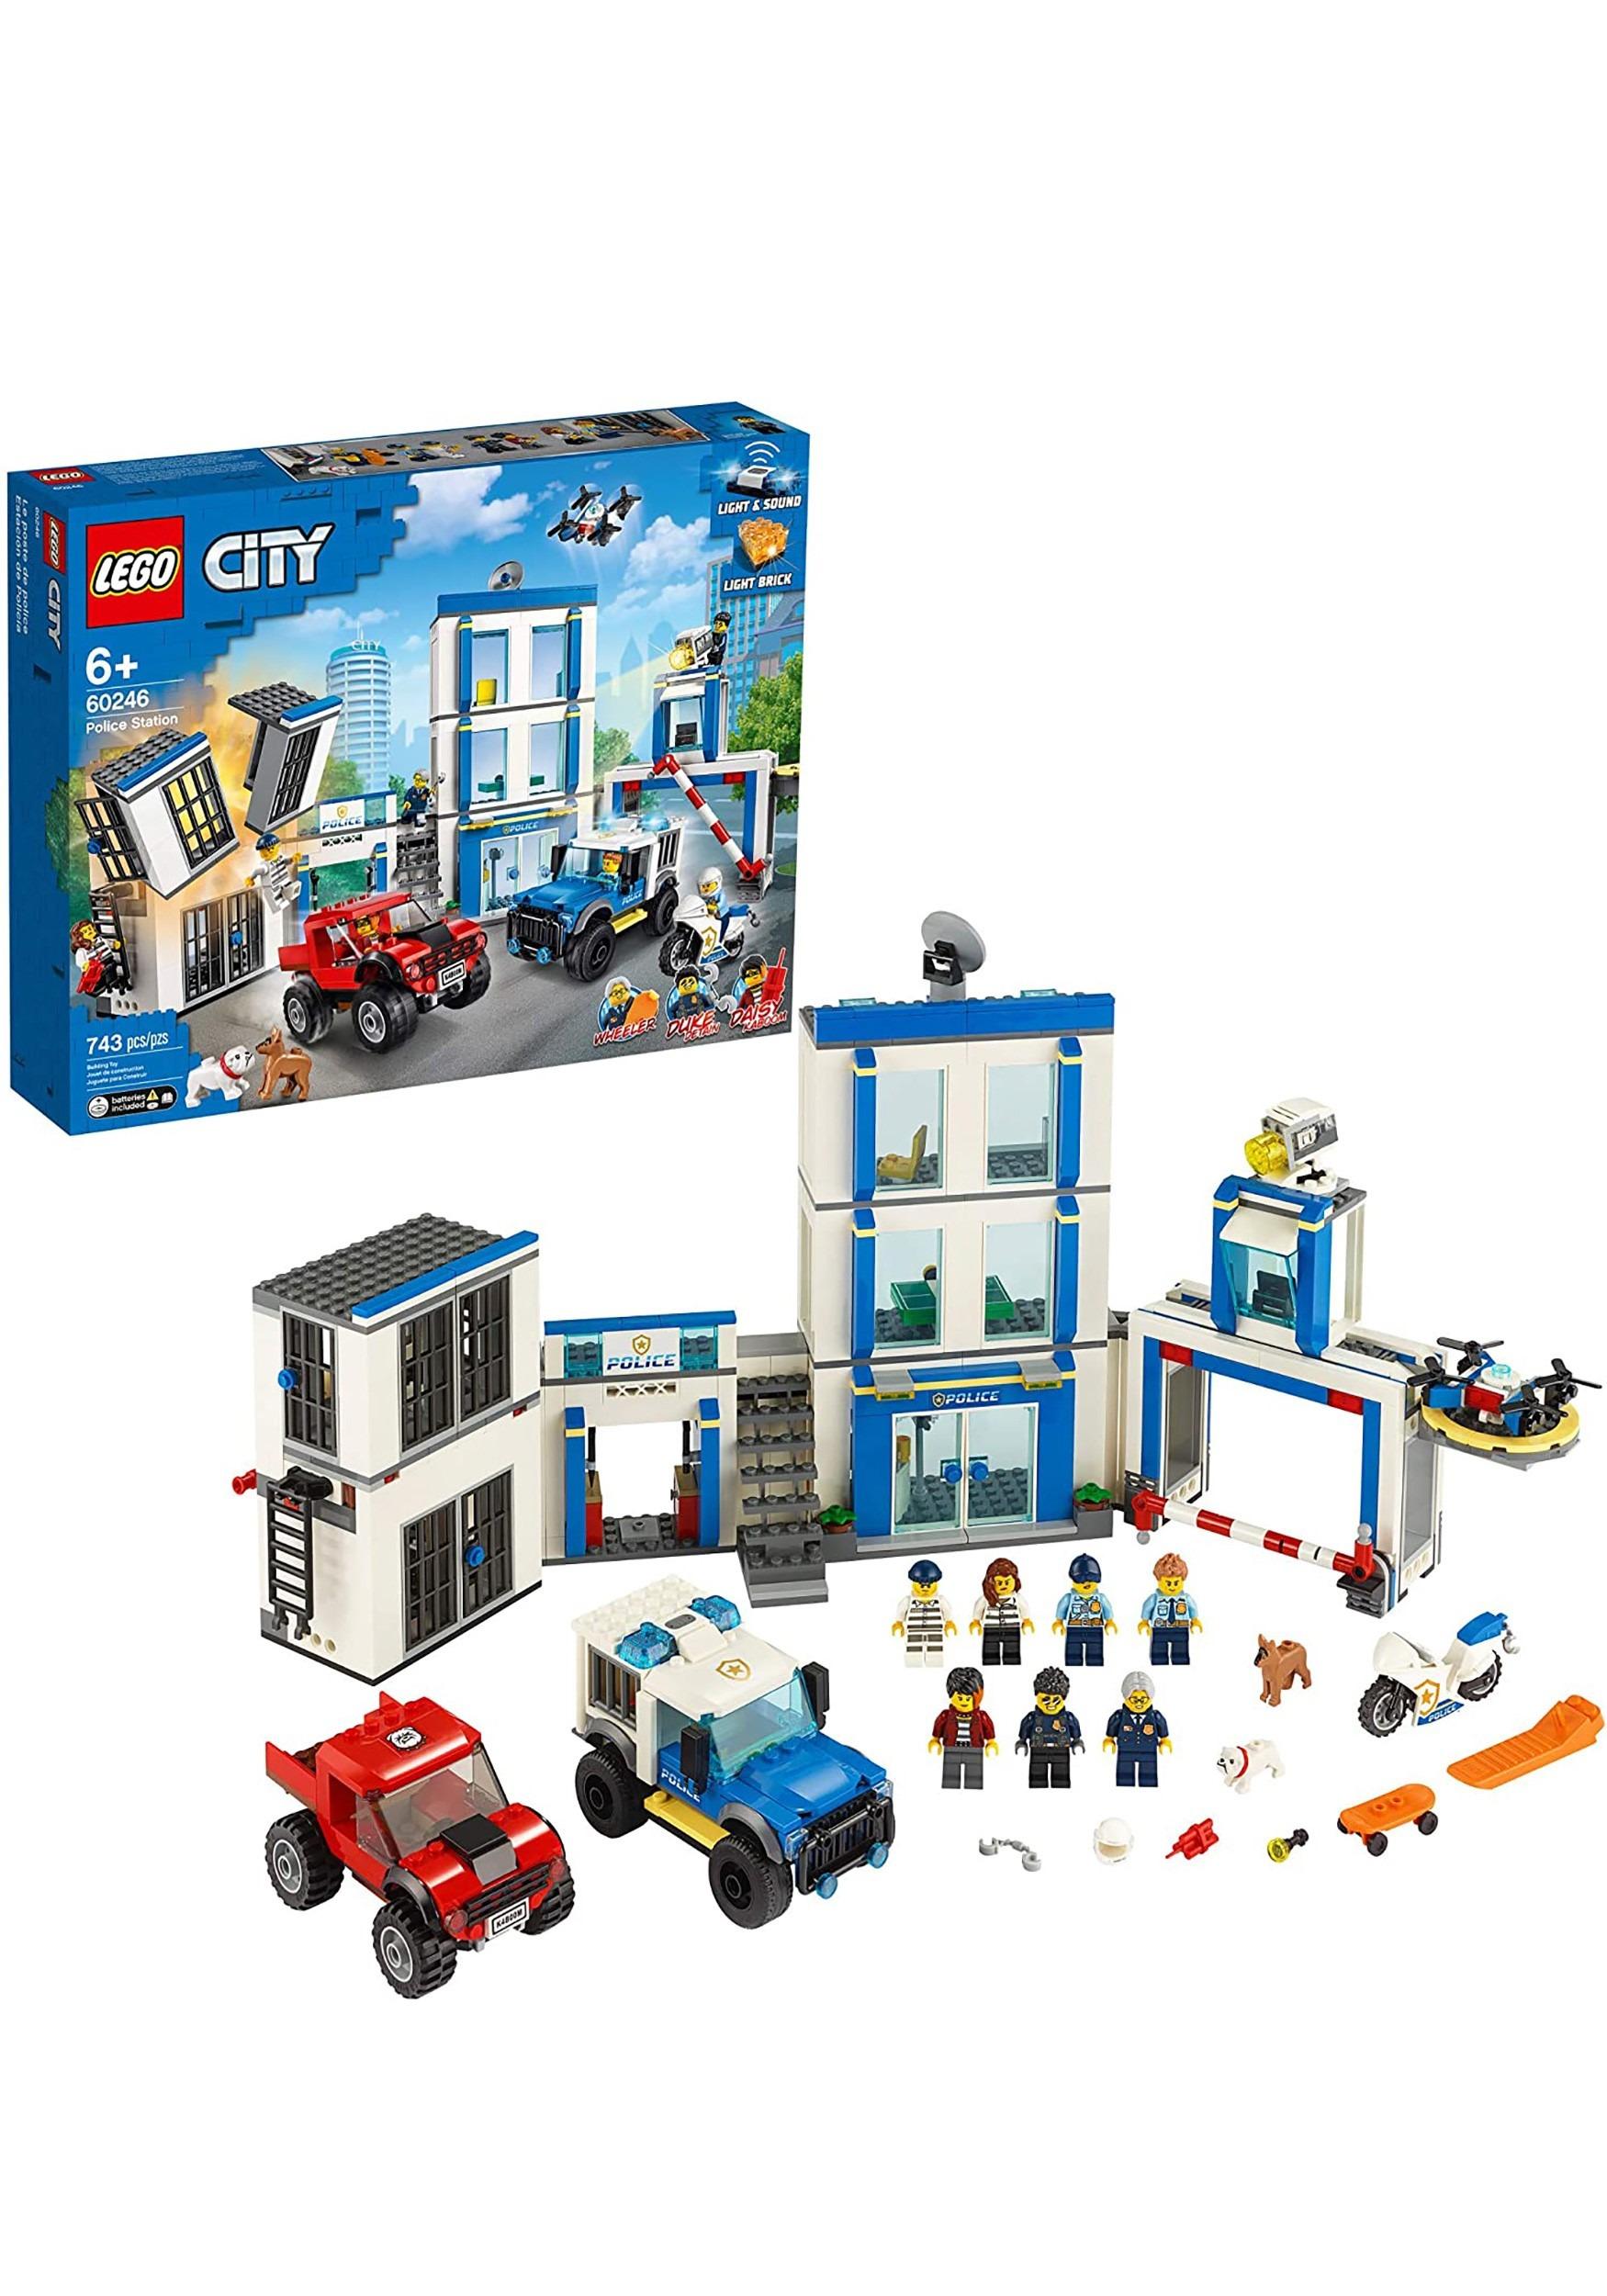 Police Station LEGO City Building Set